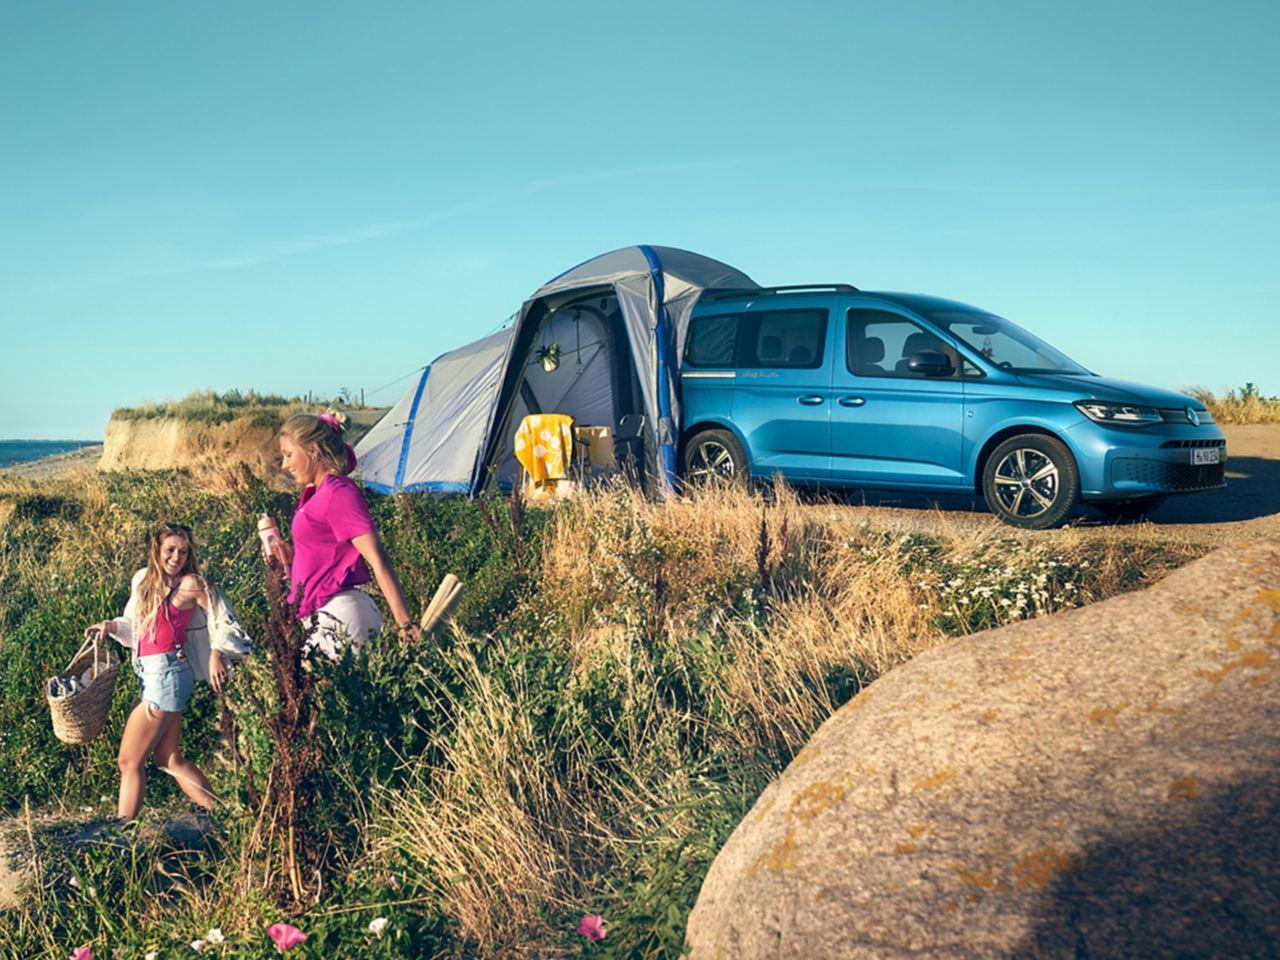 Volkswagen показал миникемпер на Caravan Salon 2021